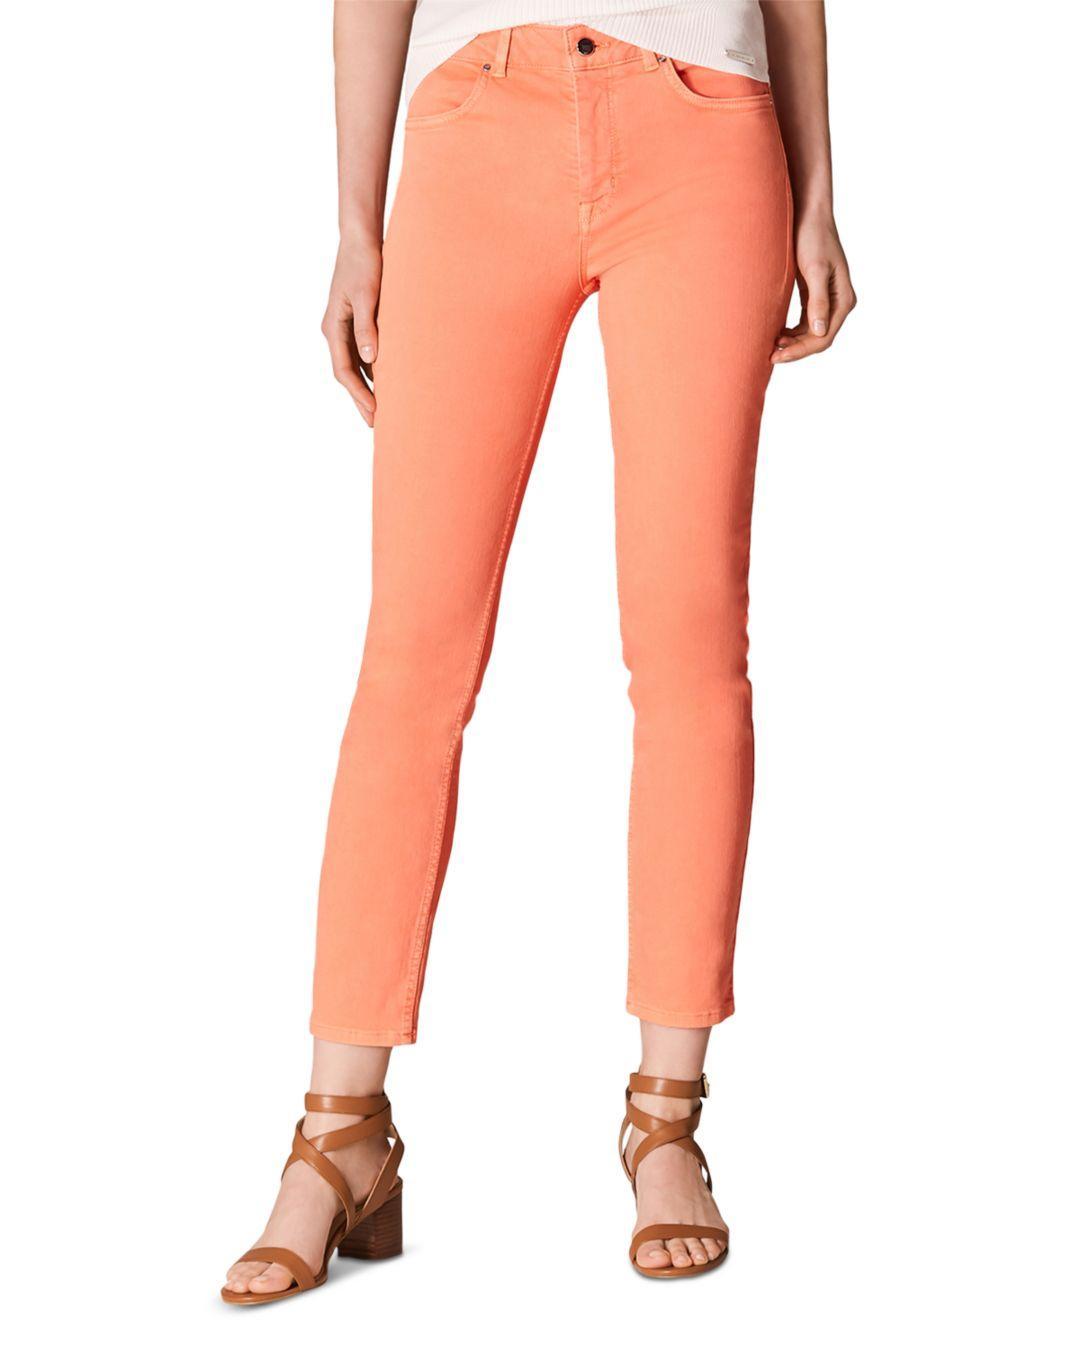 ad70ff82a6 Lyst - Karen Millen Cropped Skinny Jeans In Coral in Orange